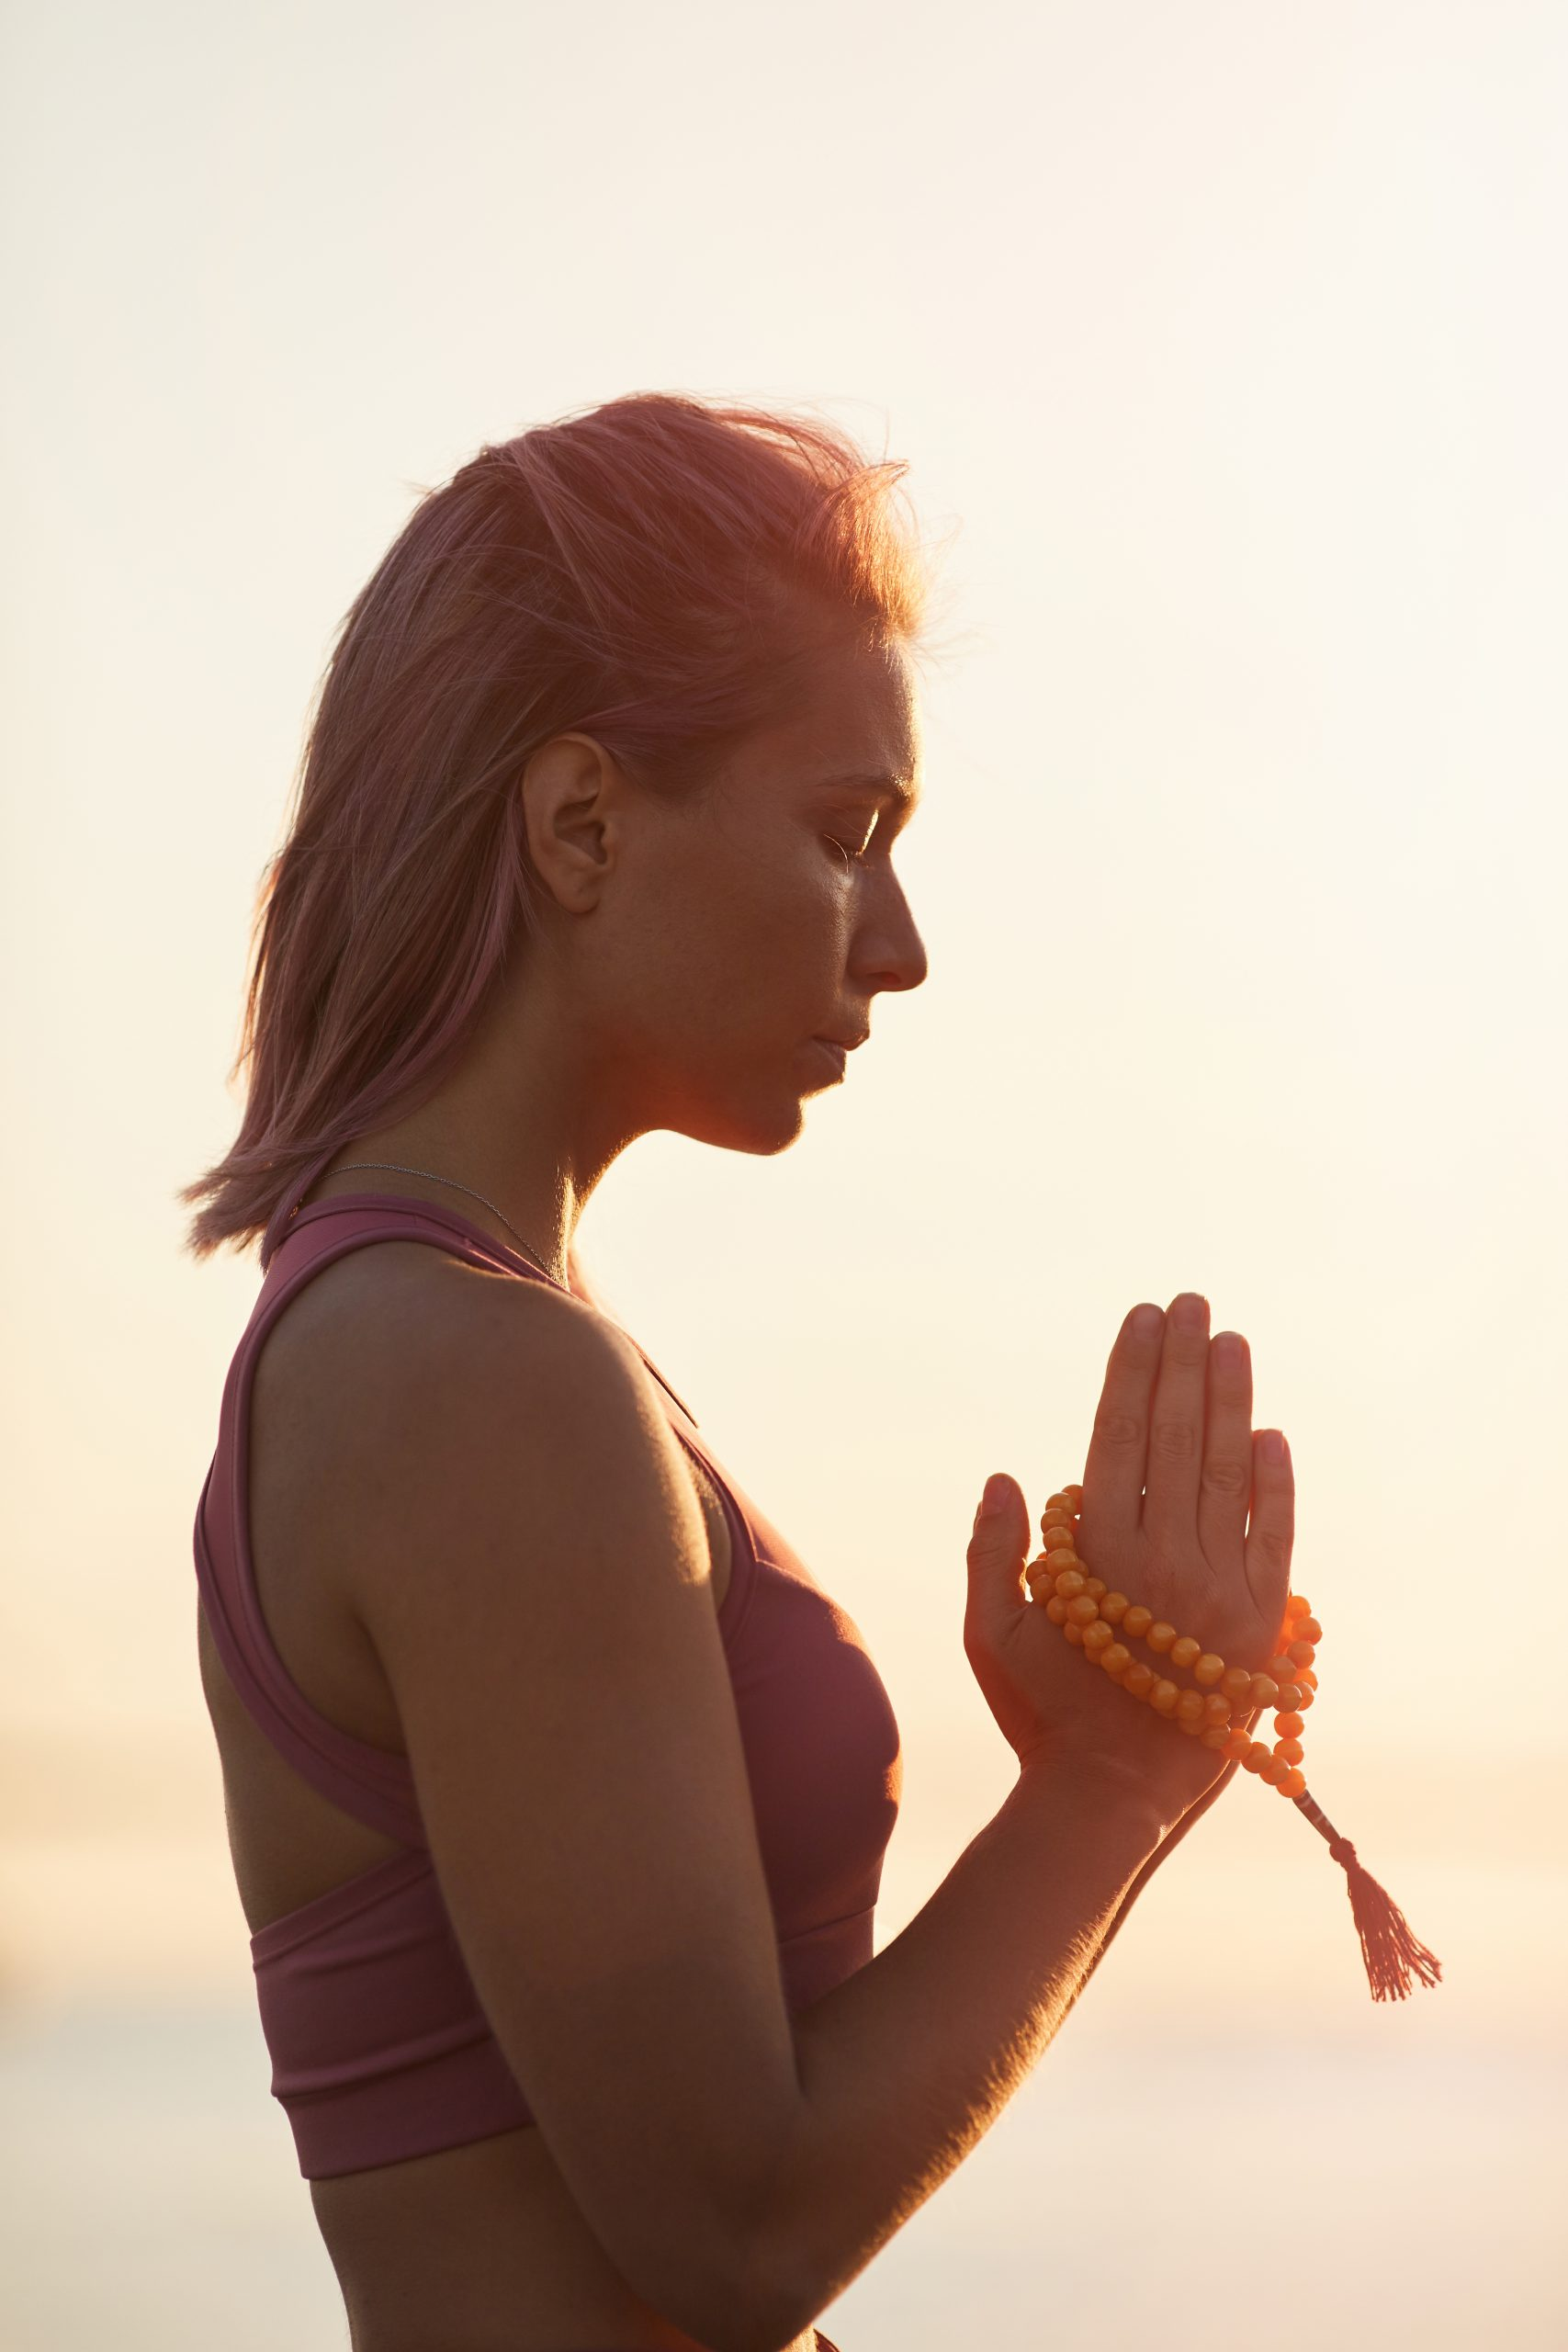 meditation during sunset W23TGB2 scaled 2